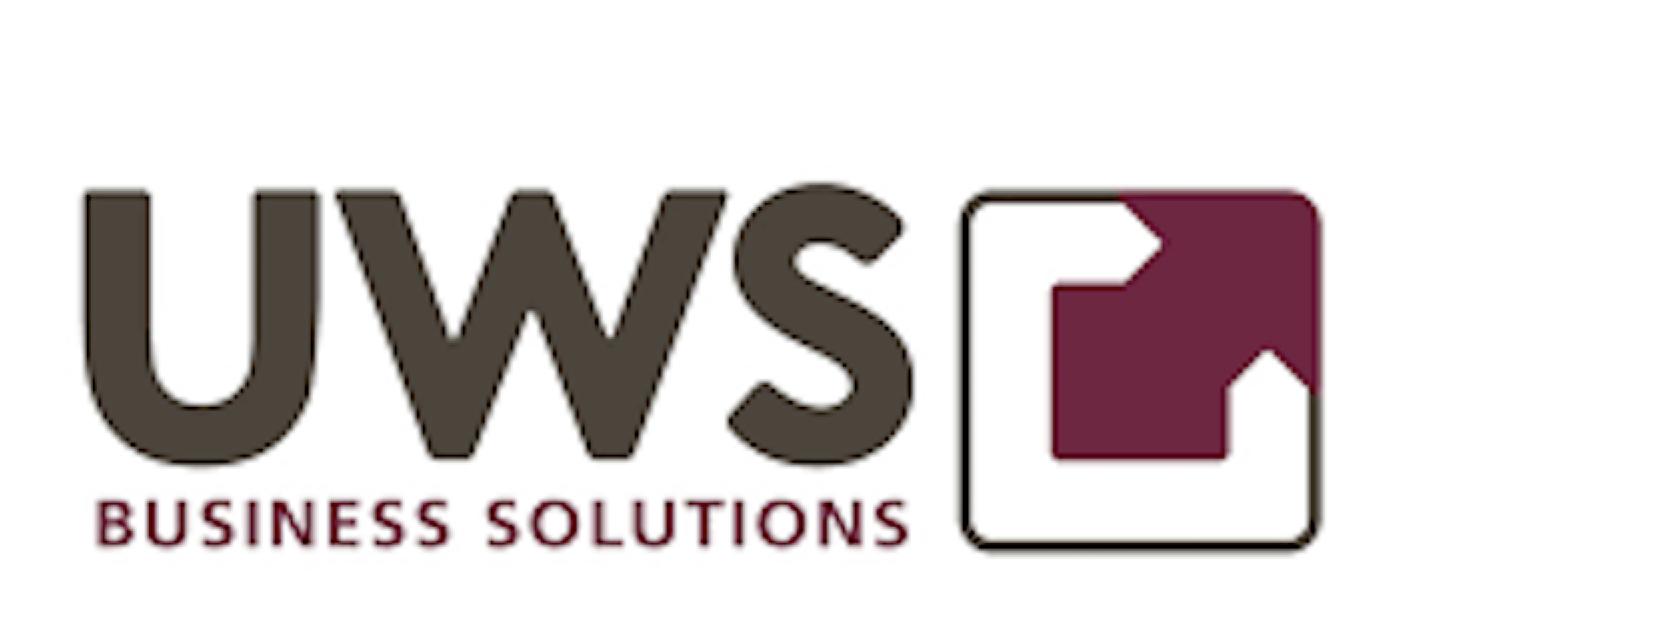 Unser Partner UWS Business Solutions